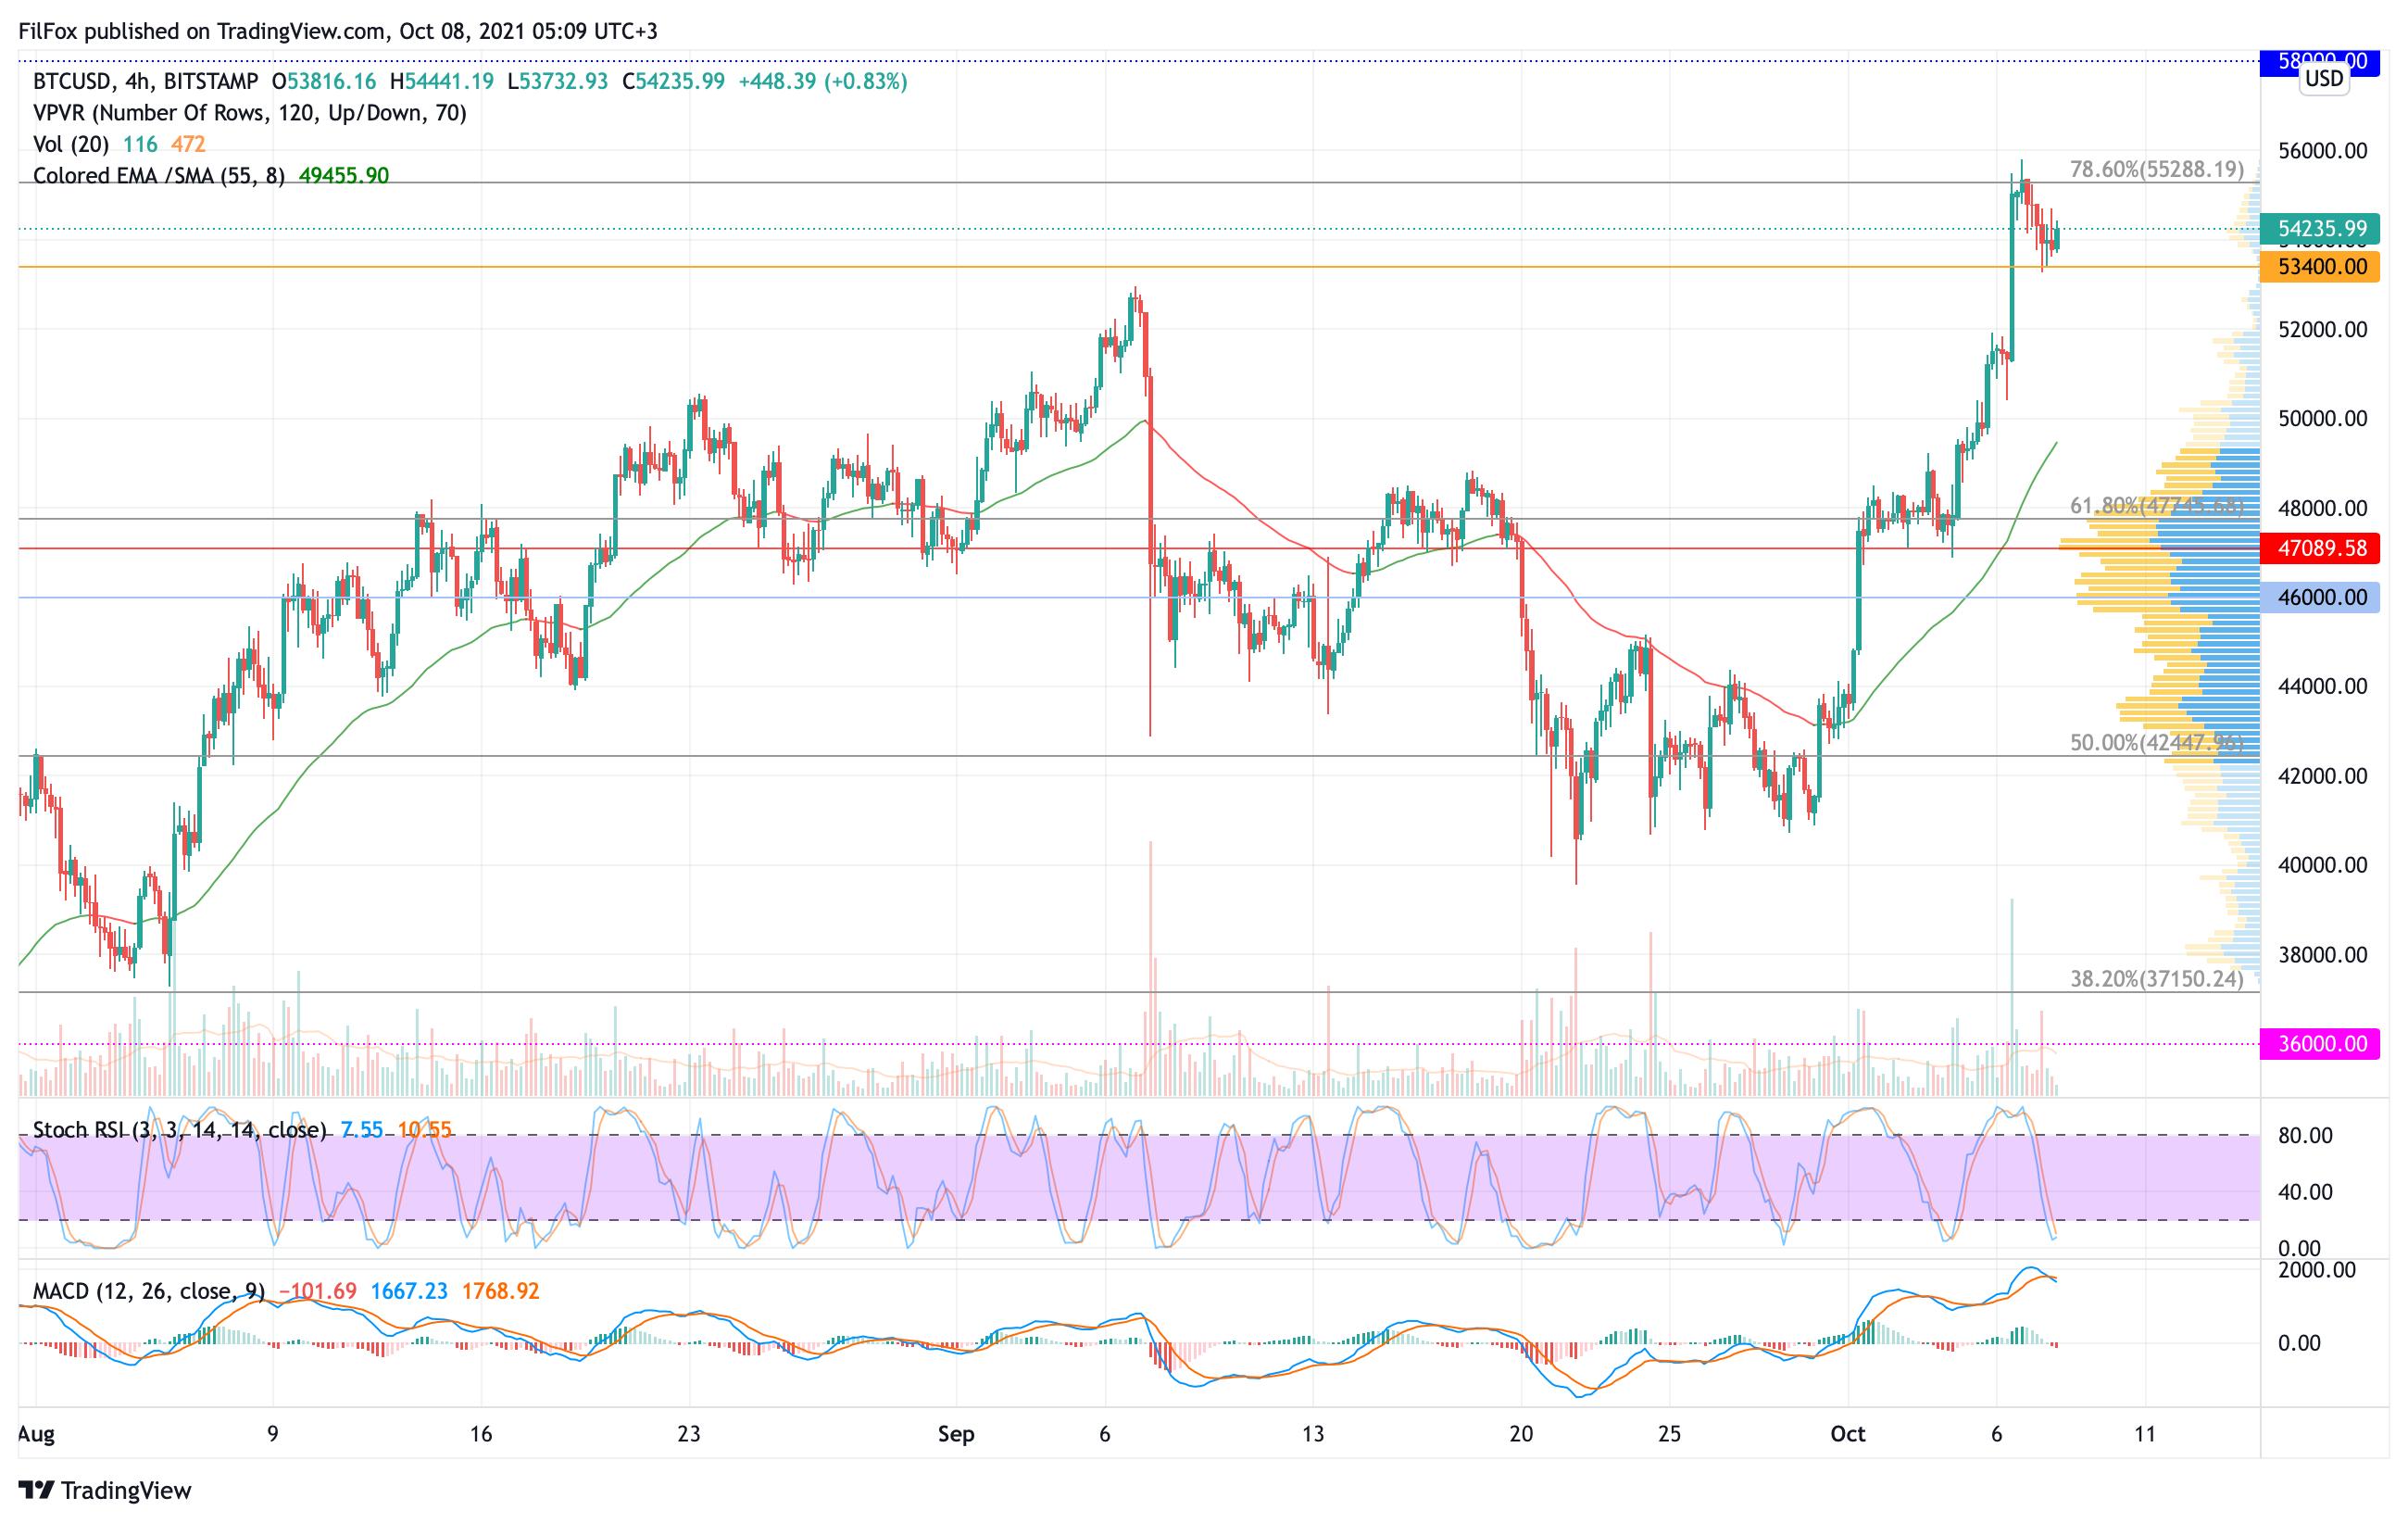 Анализ цен Bitcoin, Ethereum, XRP на 08.10.2021